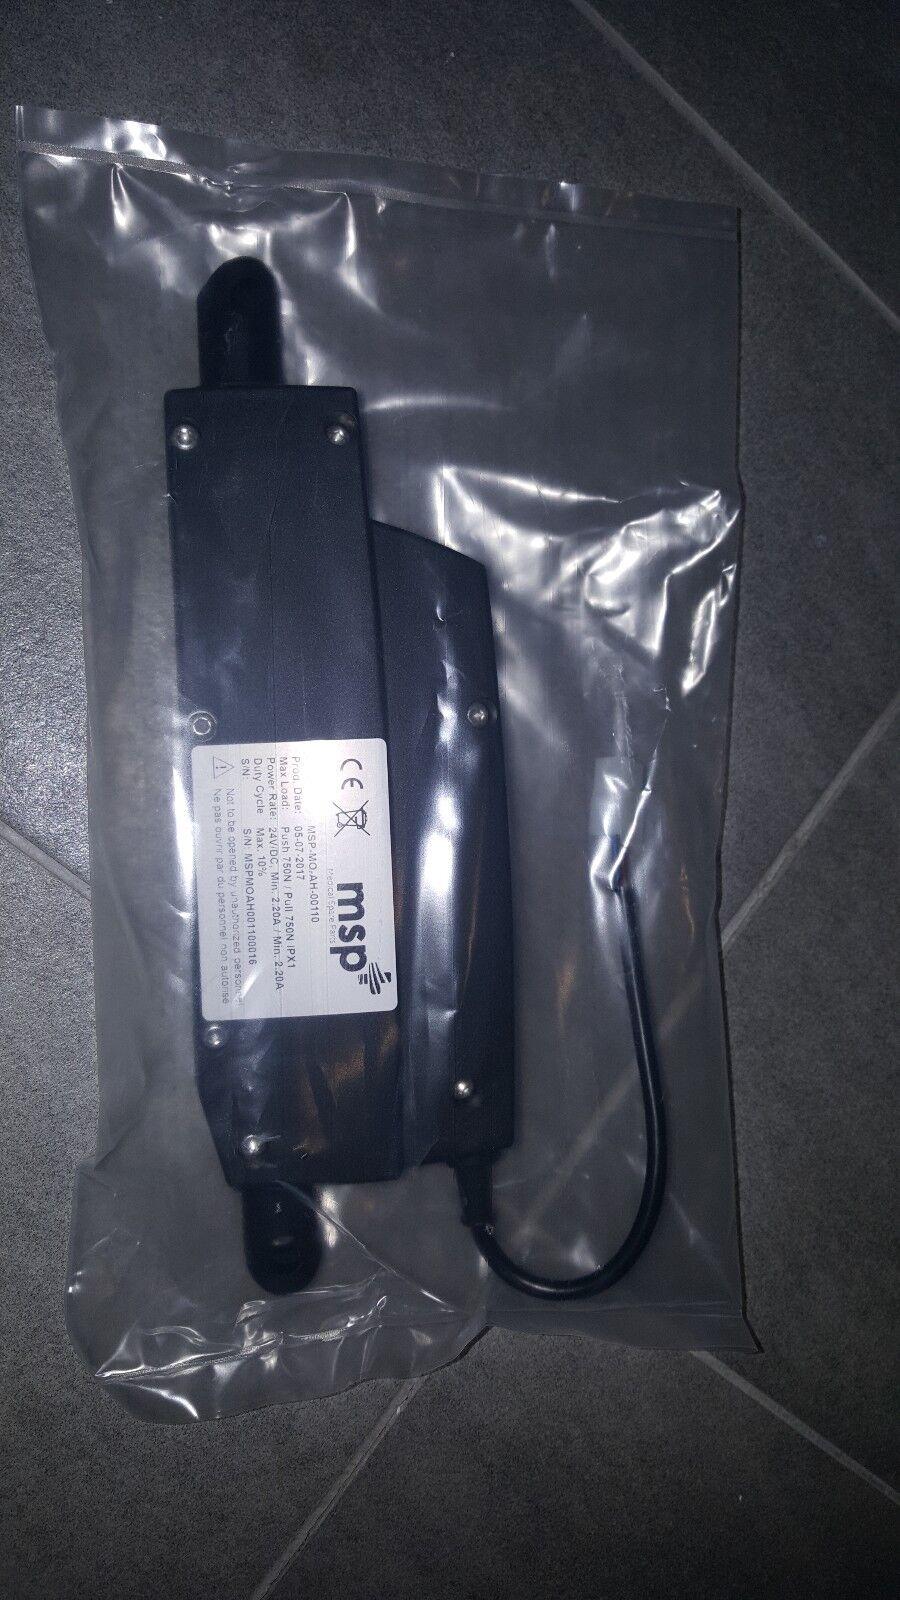 HMX977 KPX00510 Arjo Sara 3000//SARA PLUS//TEMPO 4 BUT HANDSET NEW Warranty